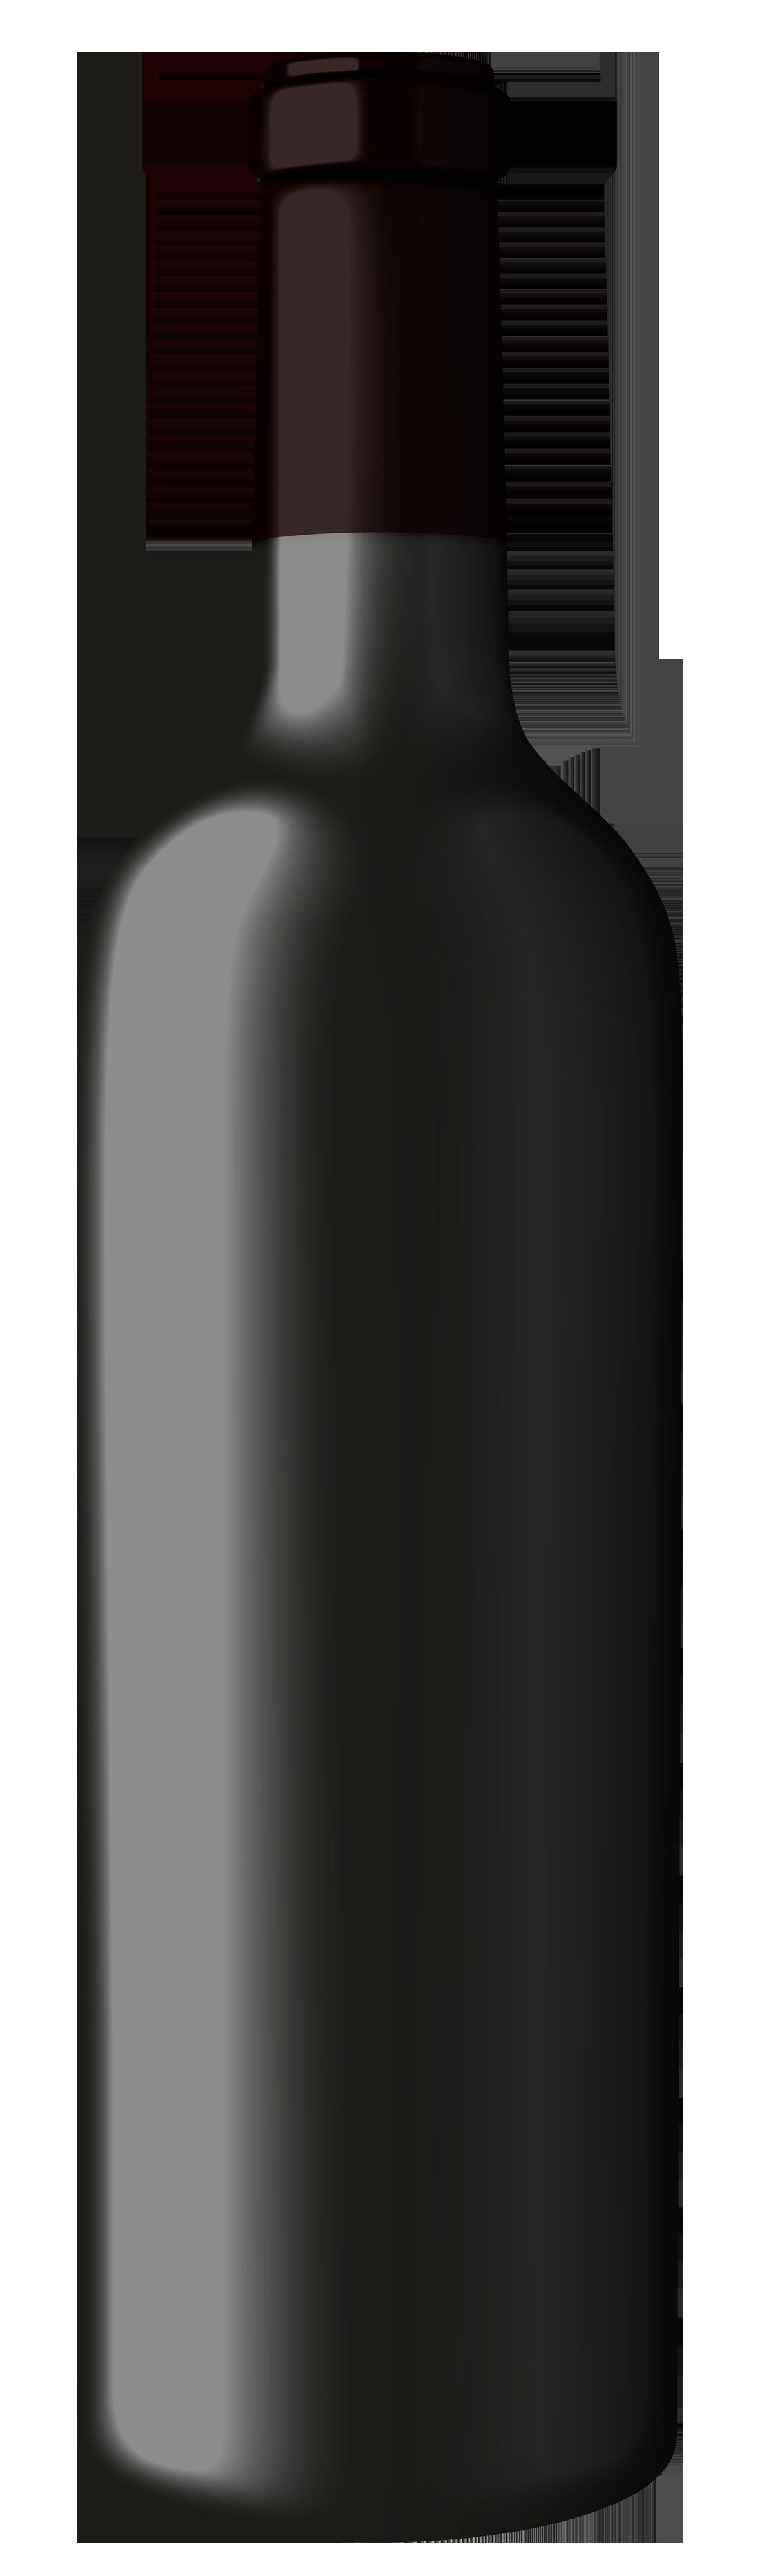 Black wine bottle clipart the clipart